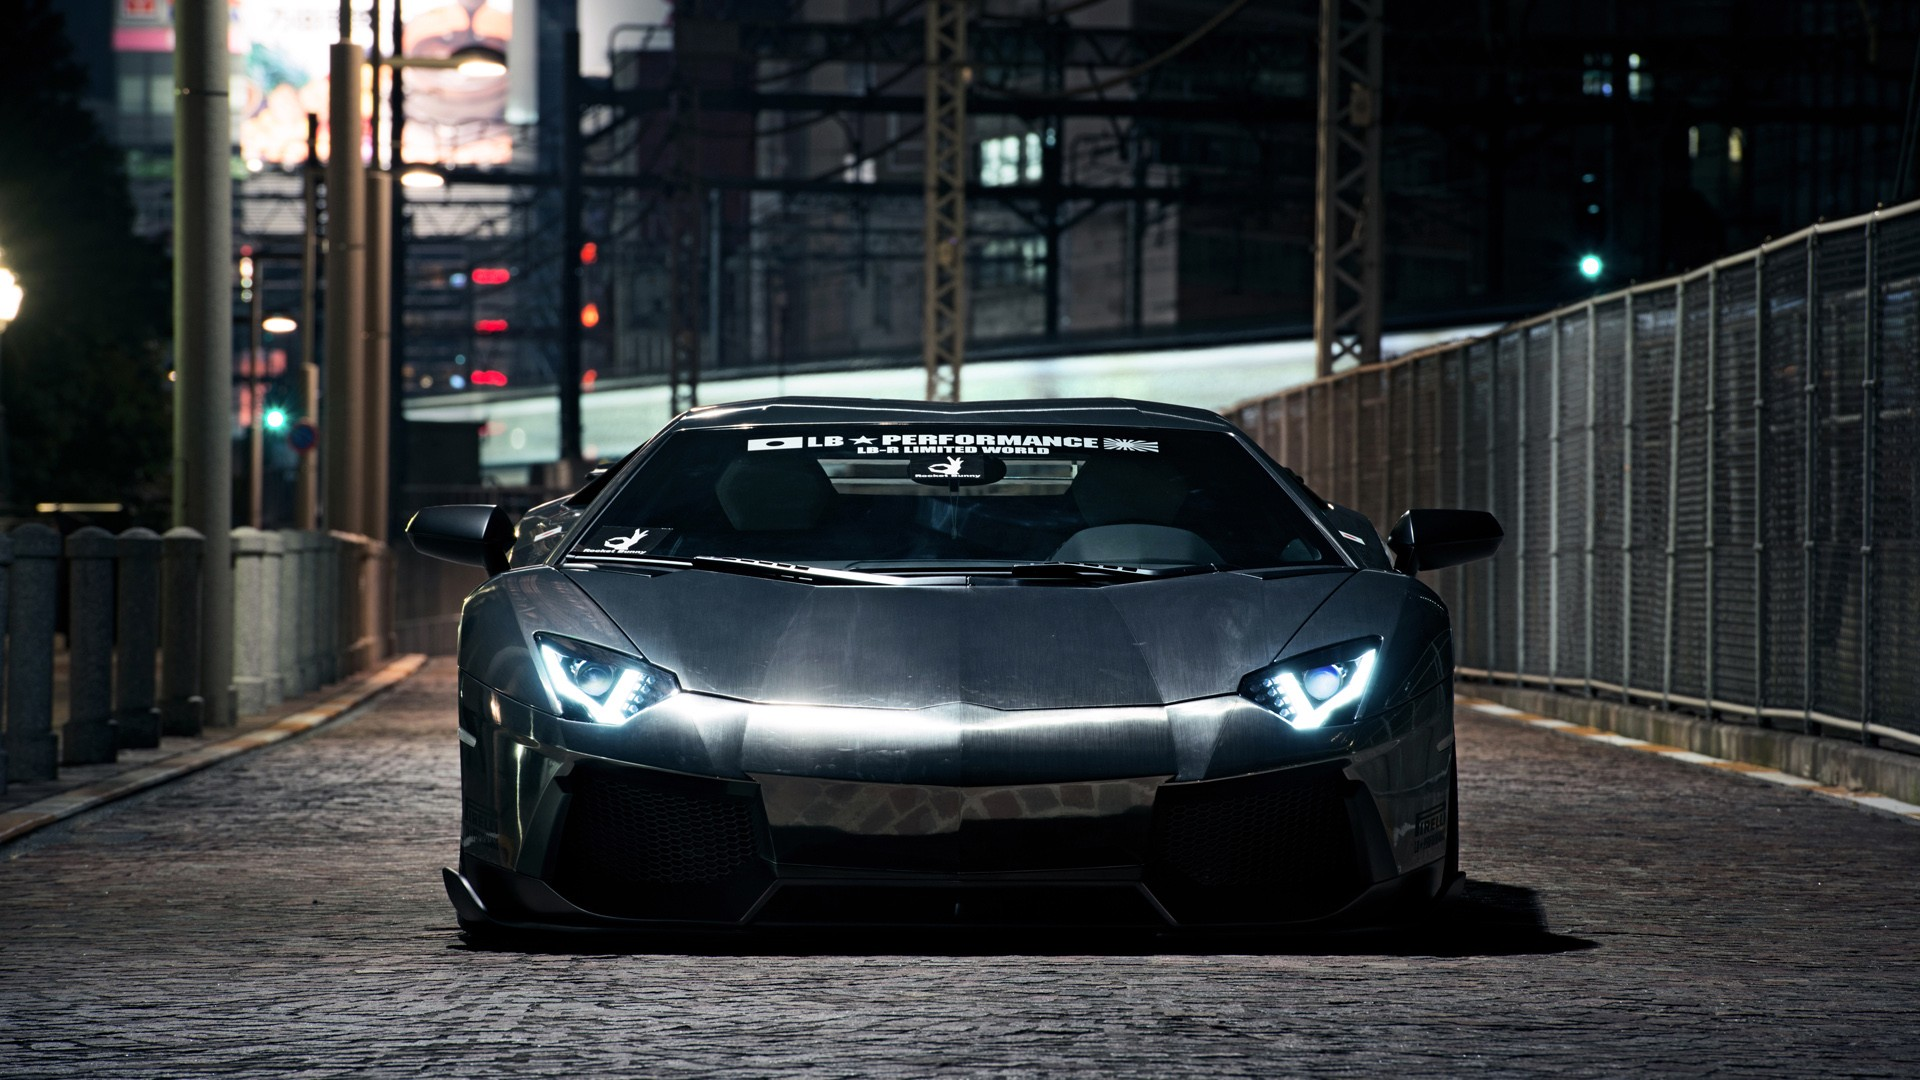 x 1080 original wallpaper lamborghini aventador lp 700 4 car downloads 29064 - Tron Lamborghini Aventador Wallpaper